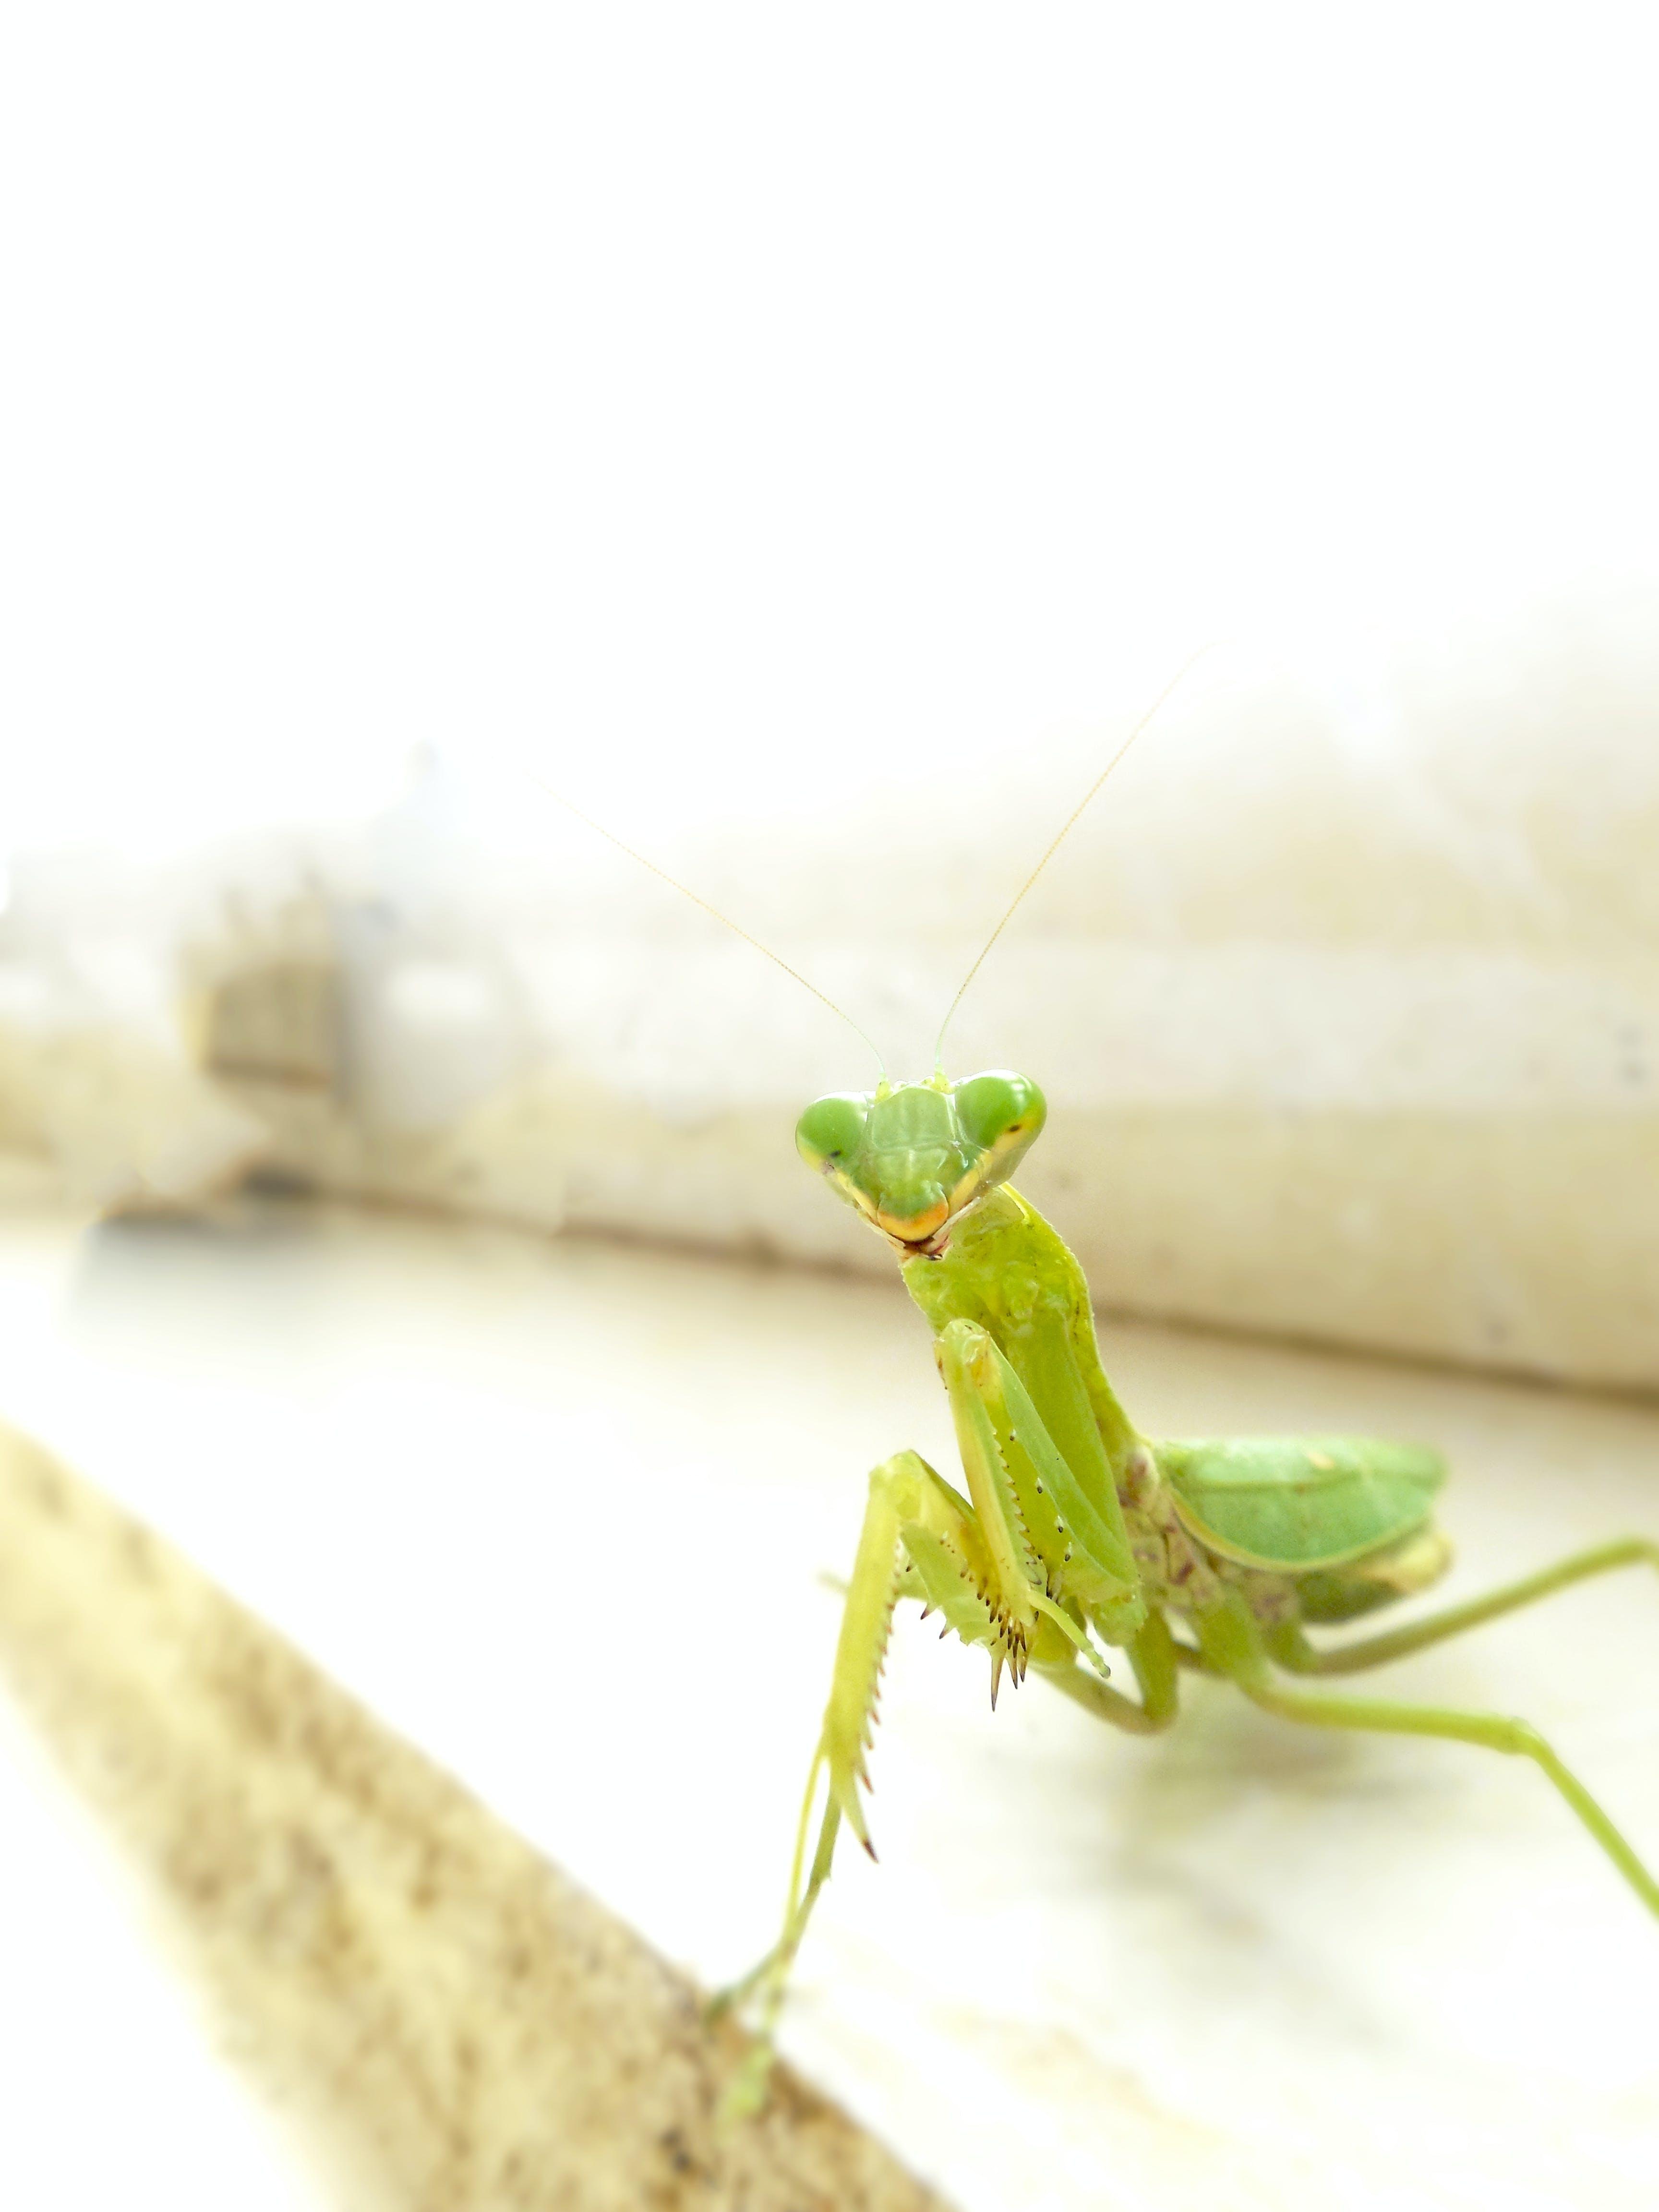 Free stock photo of grasshopper, green, smiling, vivid color